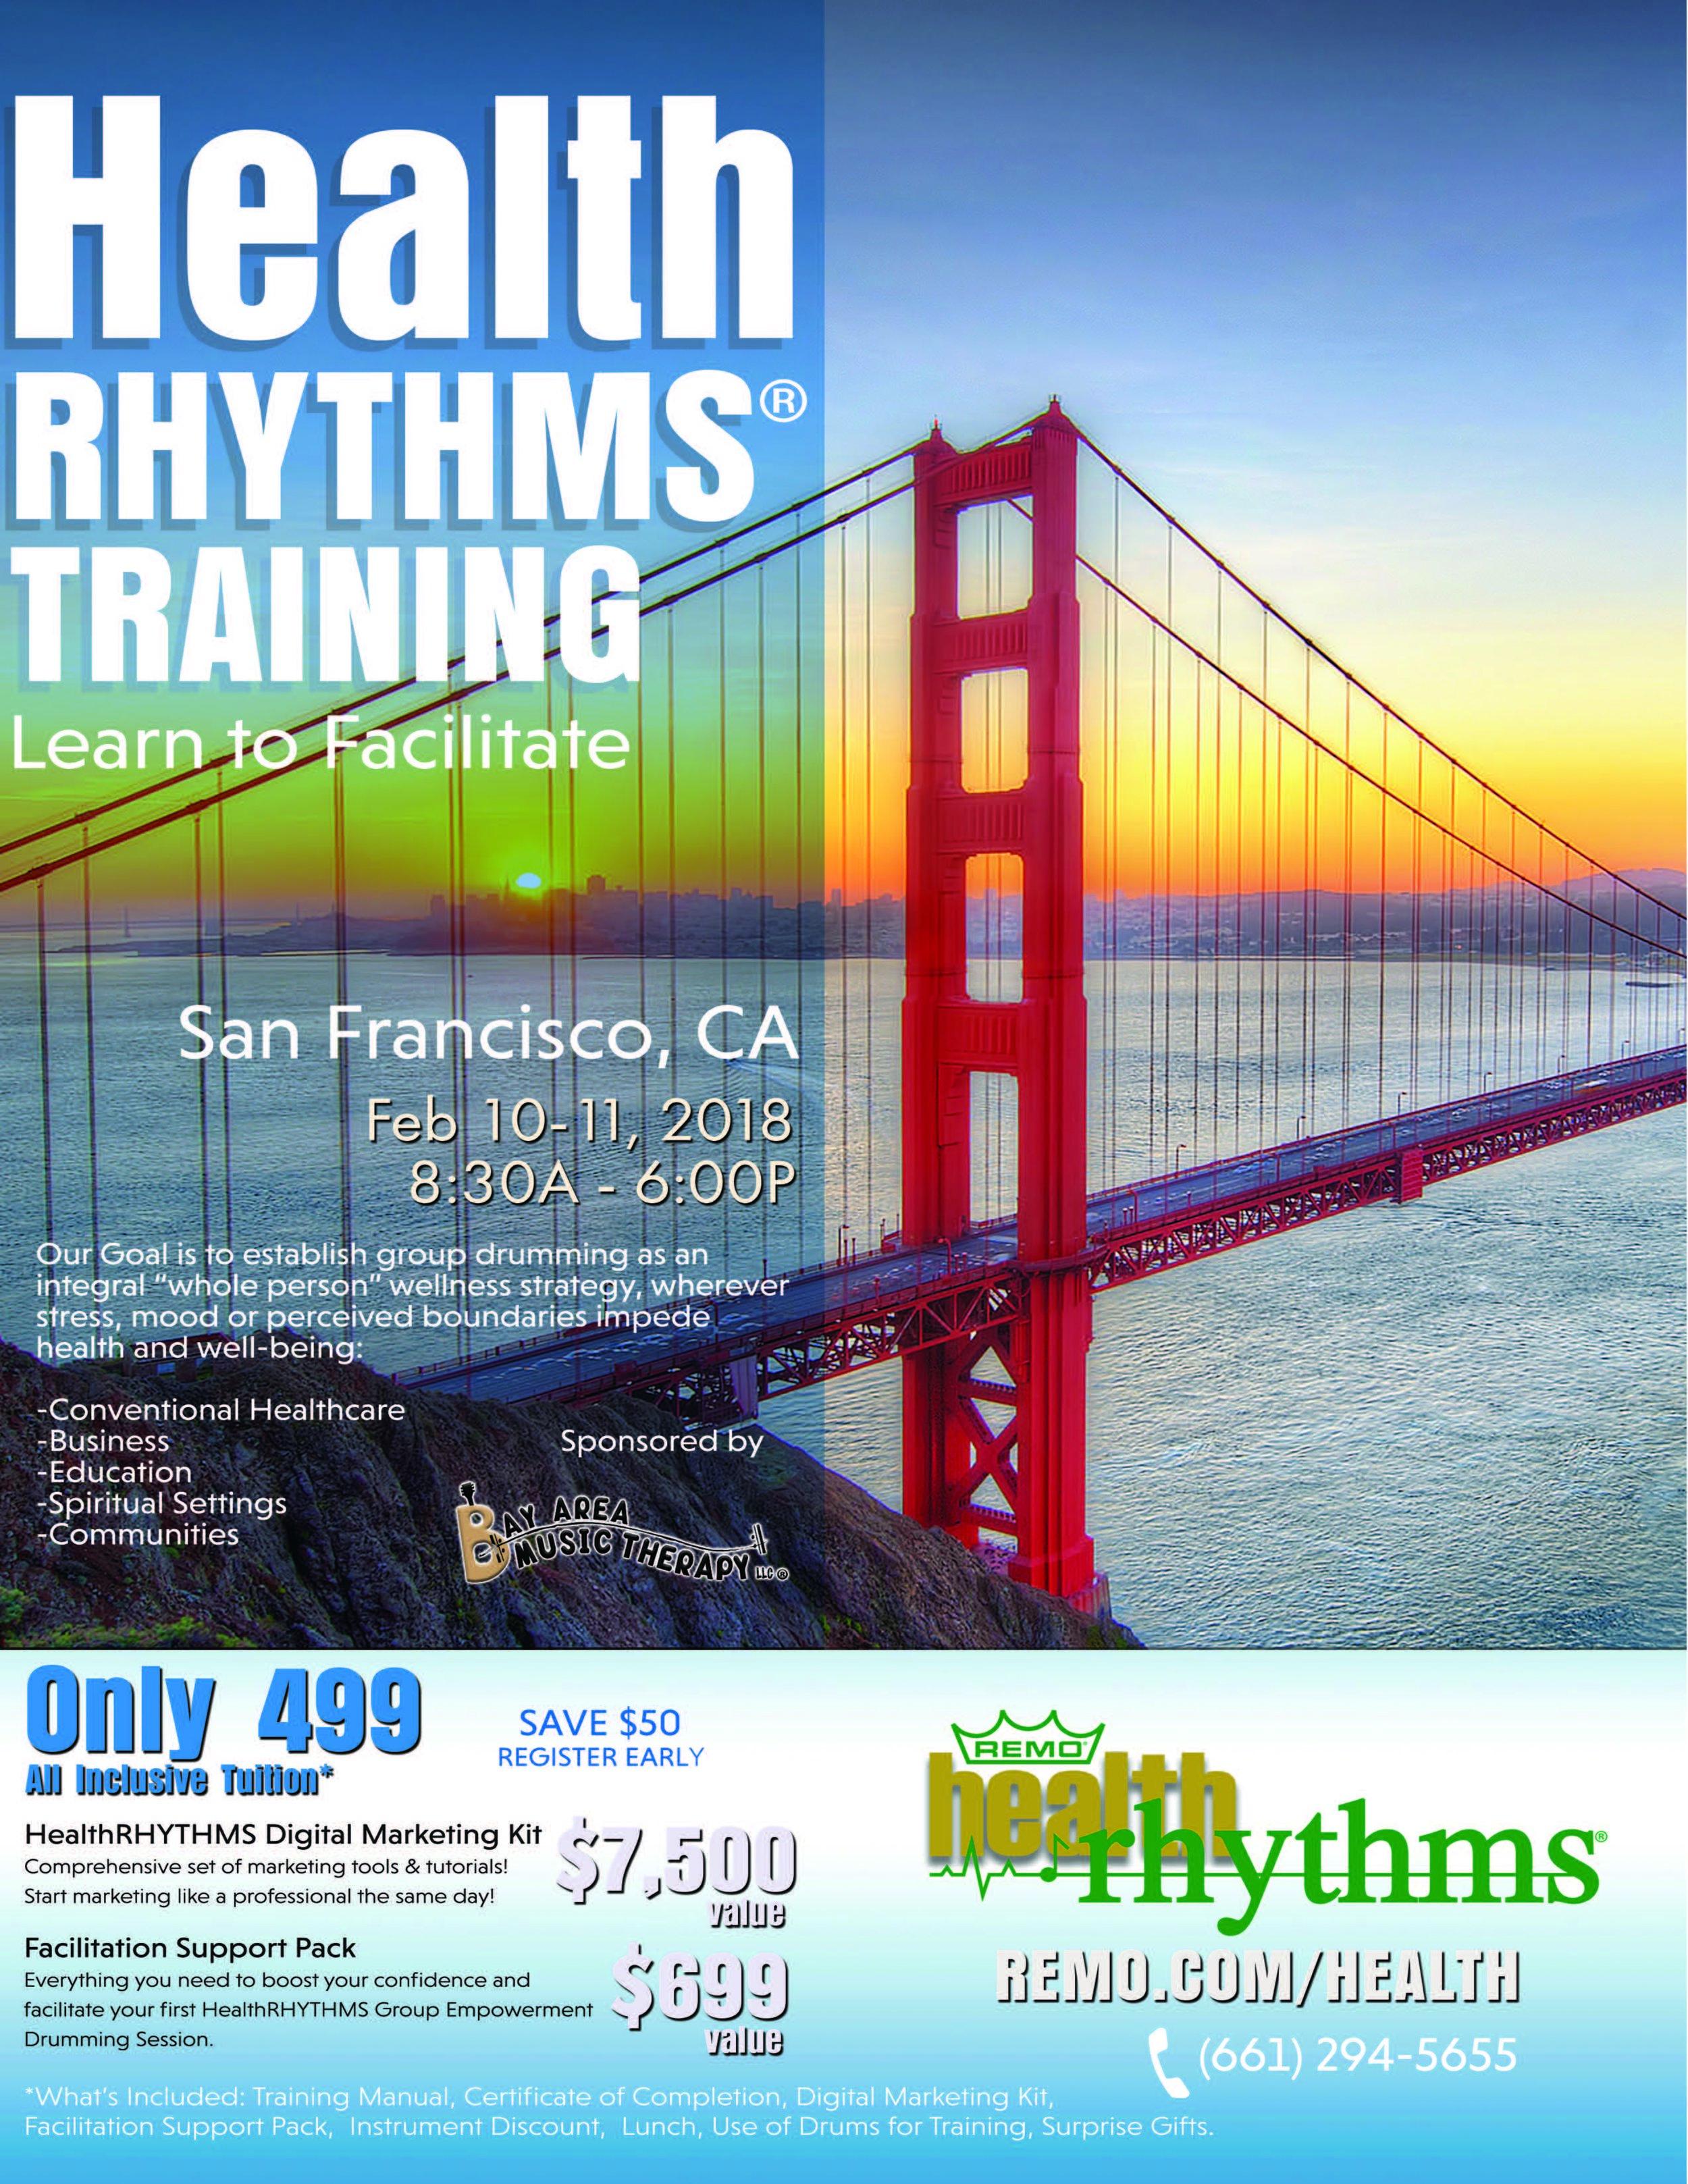 HealthRHYTHMS-Flyer-SFO_hr 1.jpg